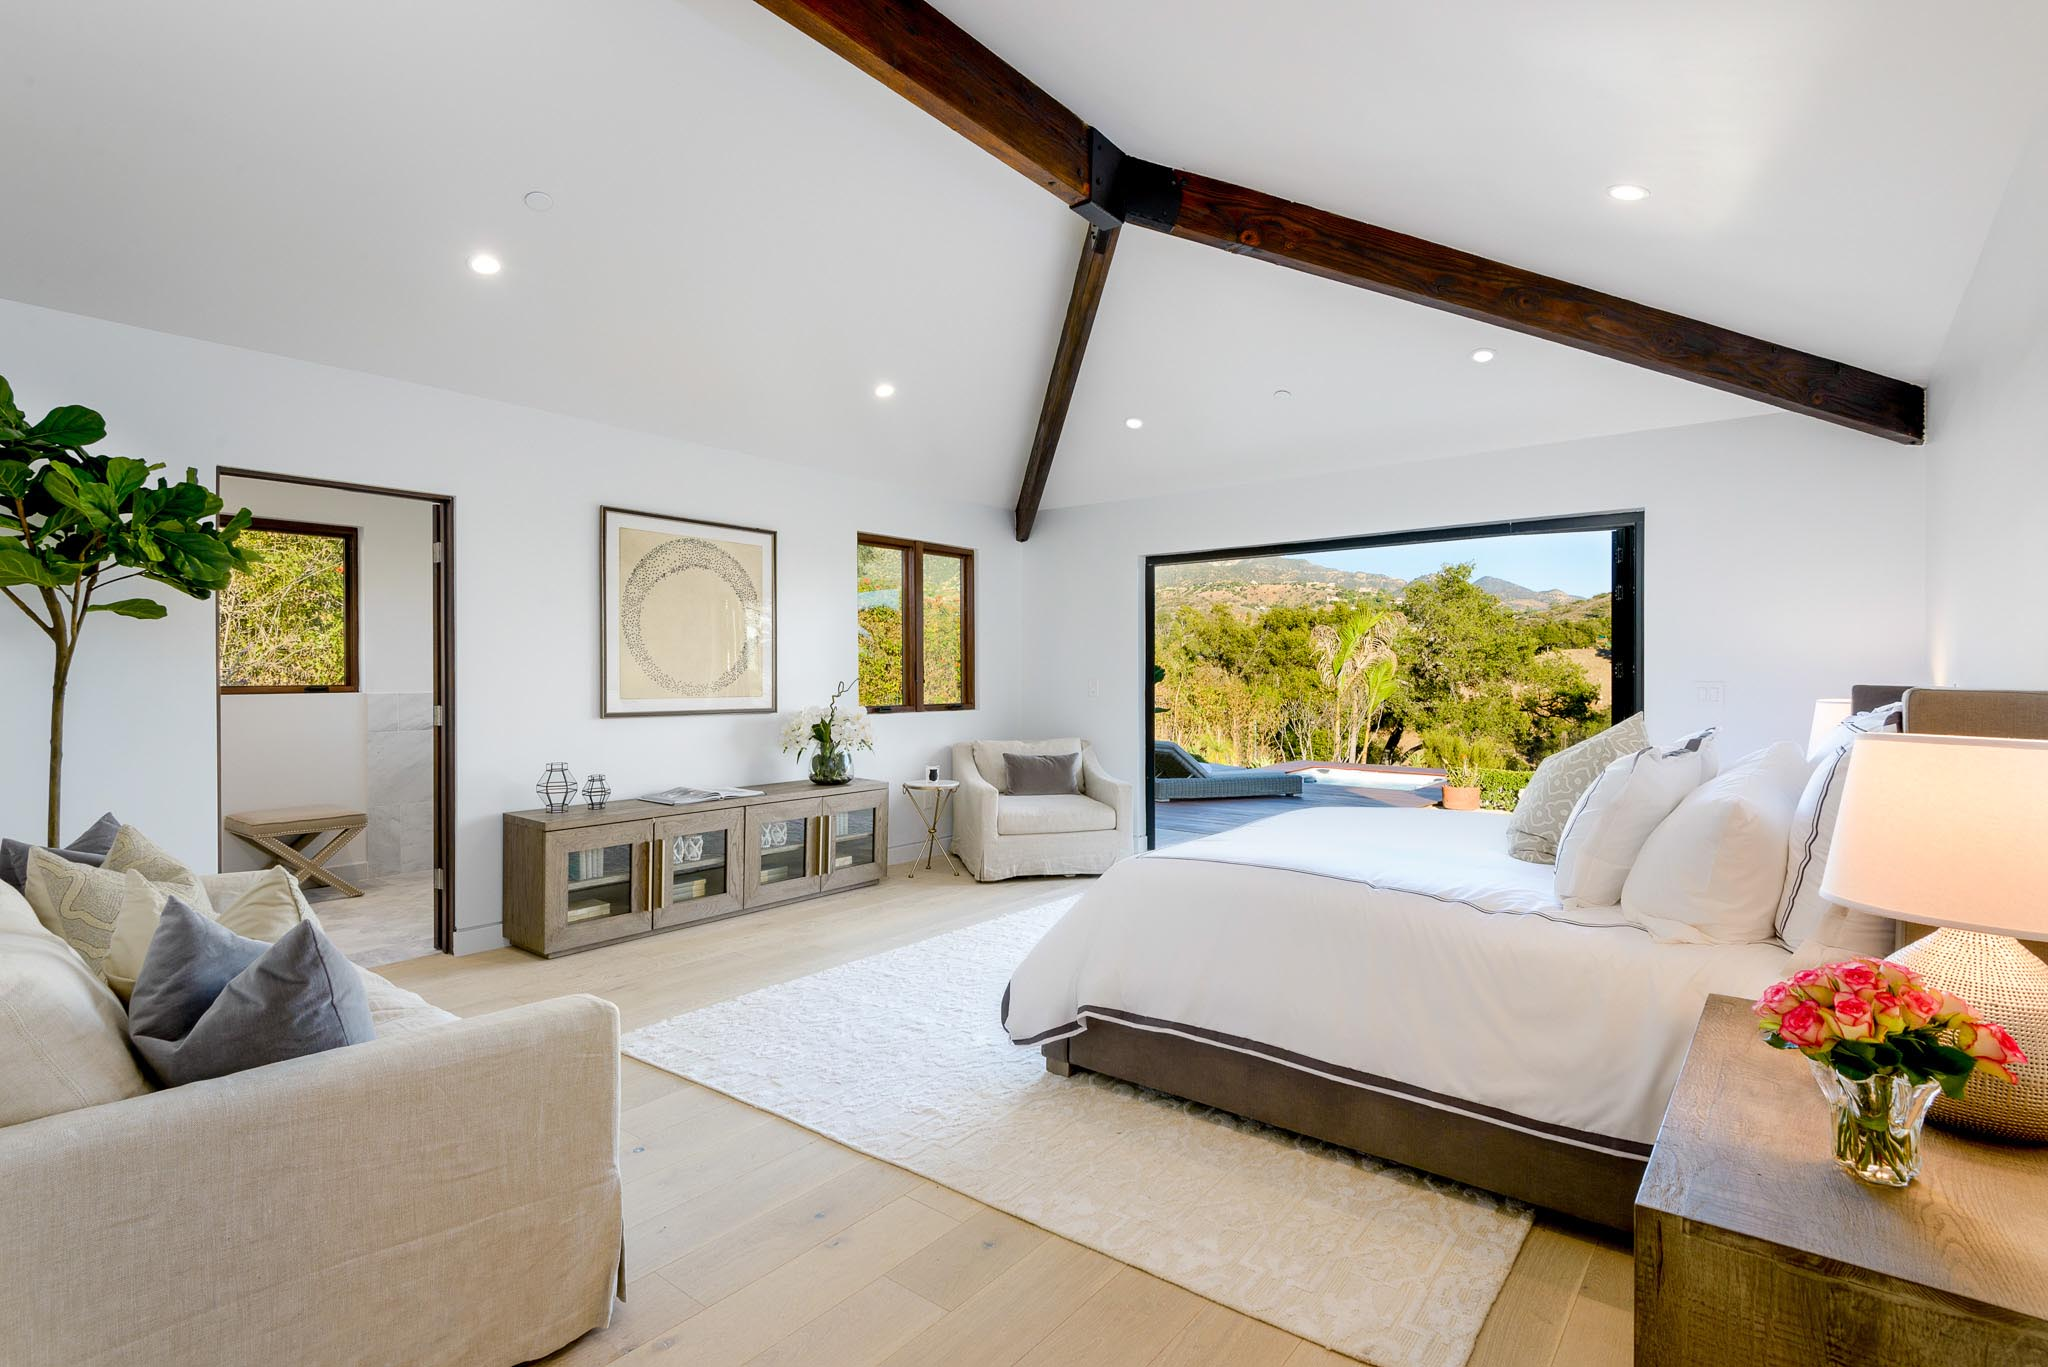 bedroom retreat with NanaWall SL45 FoldFlat opening glass wall